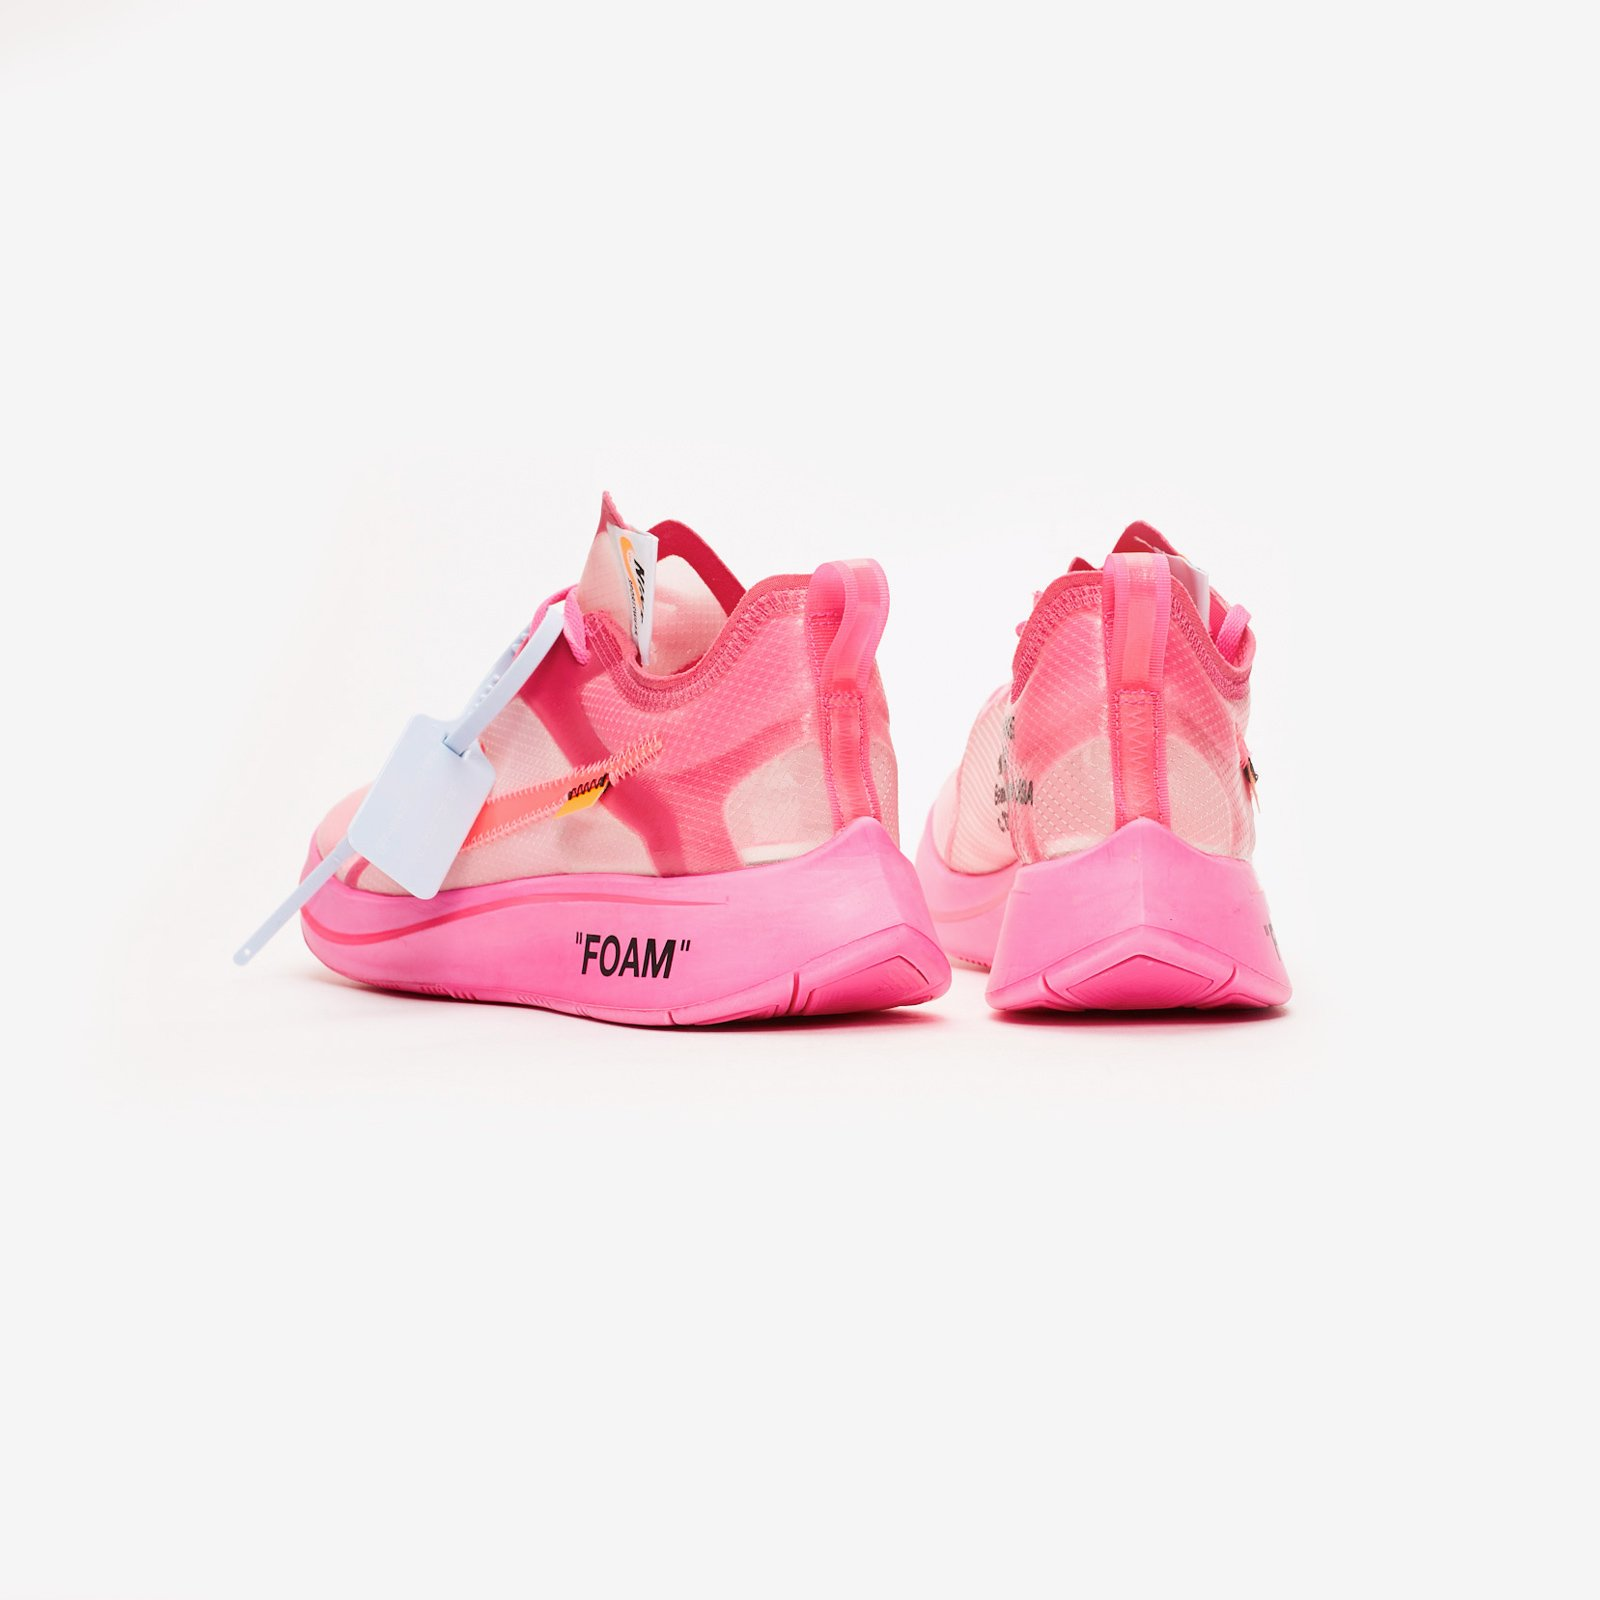 336eb46822b8 Nike The 10  Zoom Fly - Aj4588-600 - Sneakersnstuff